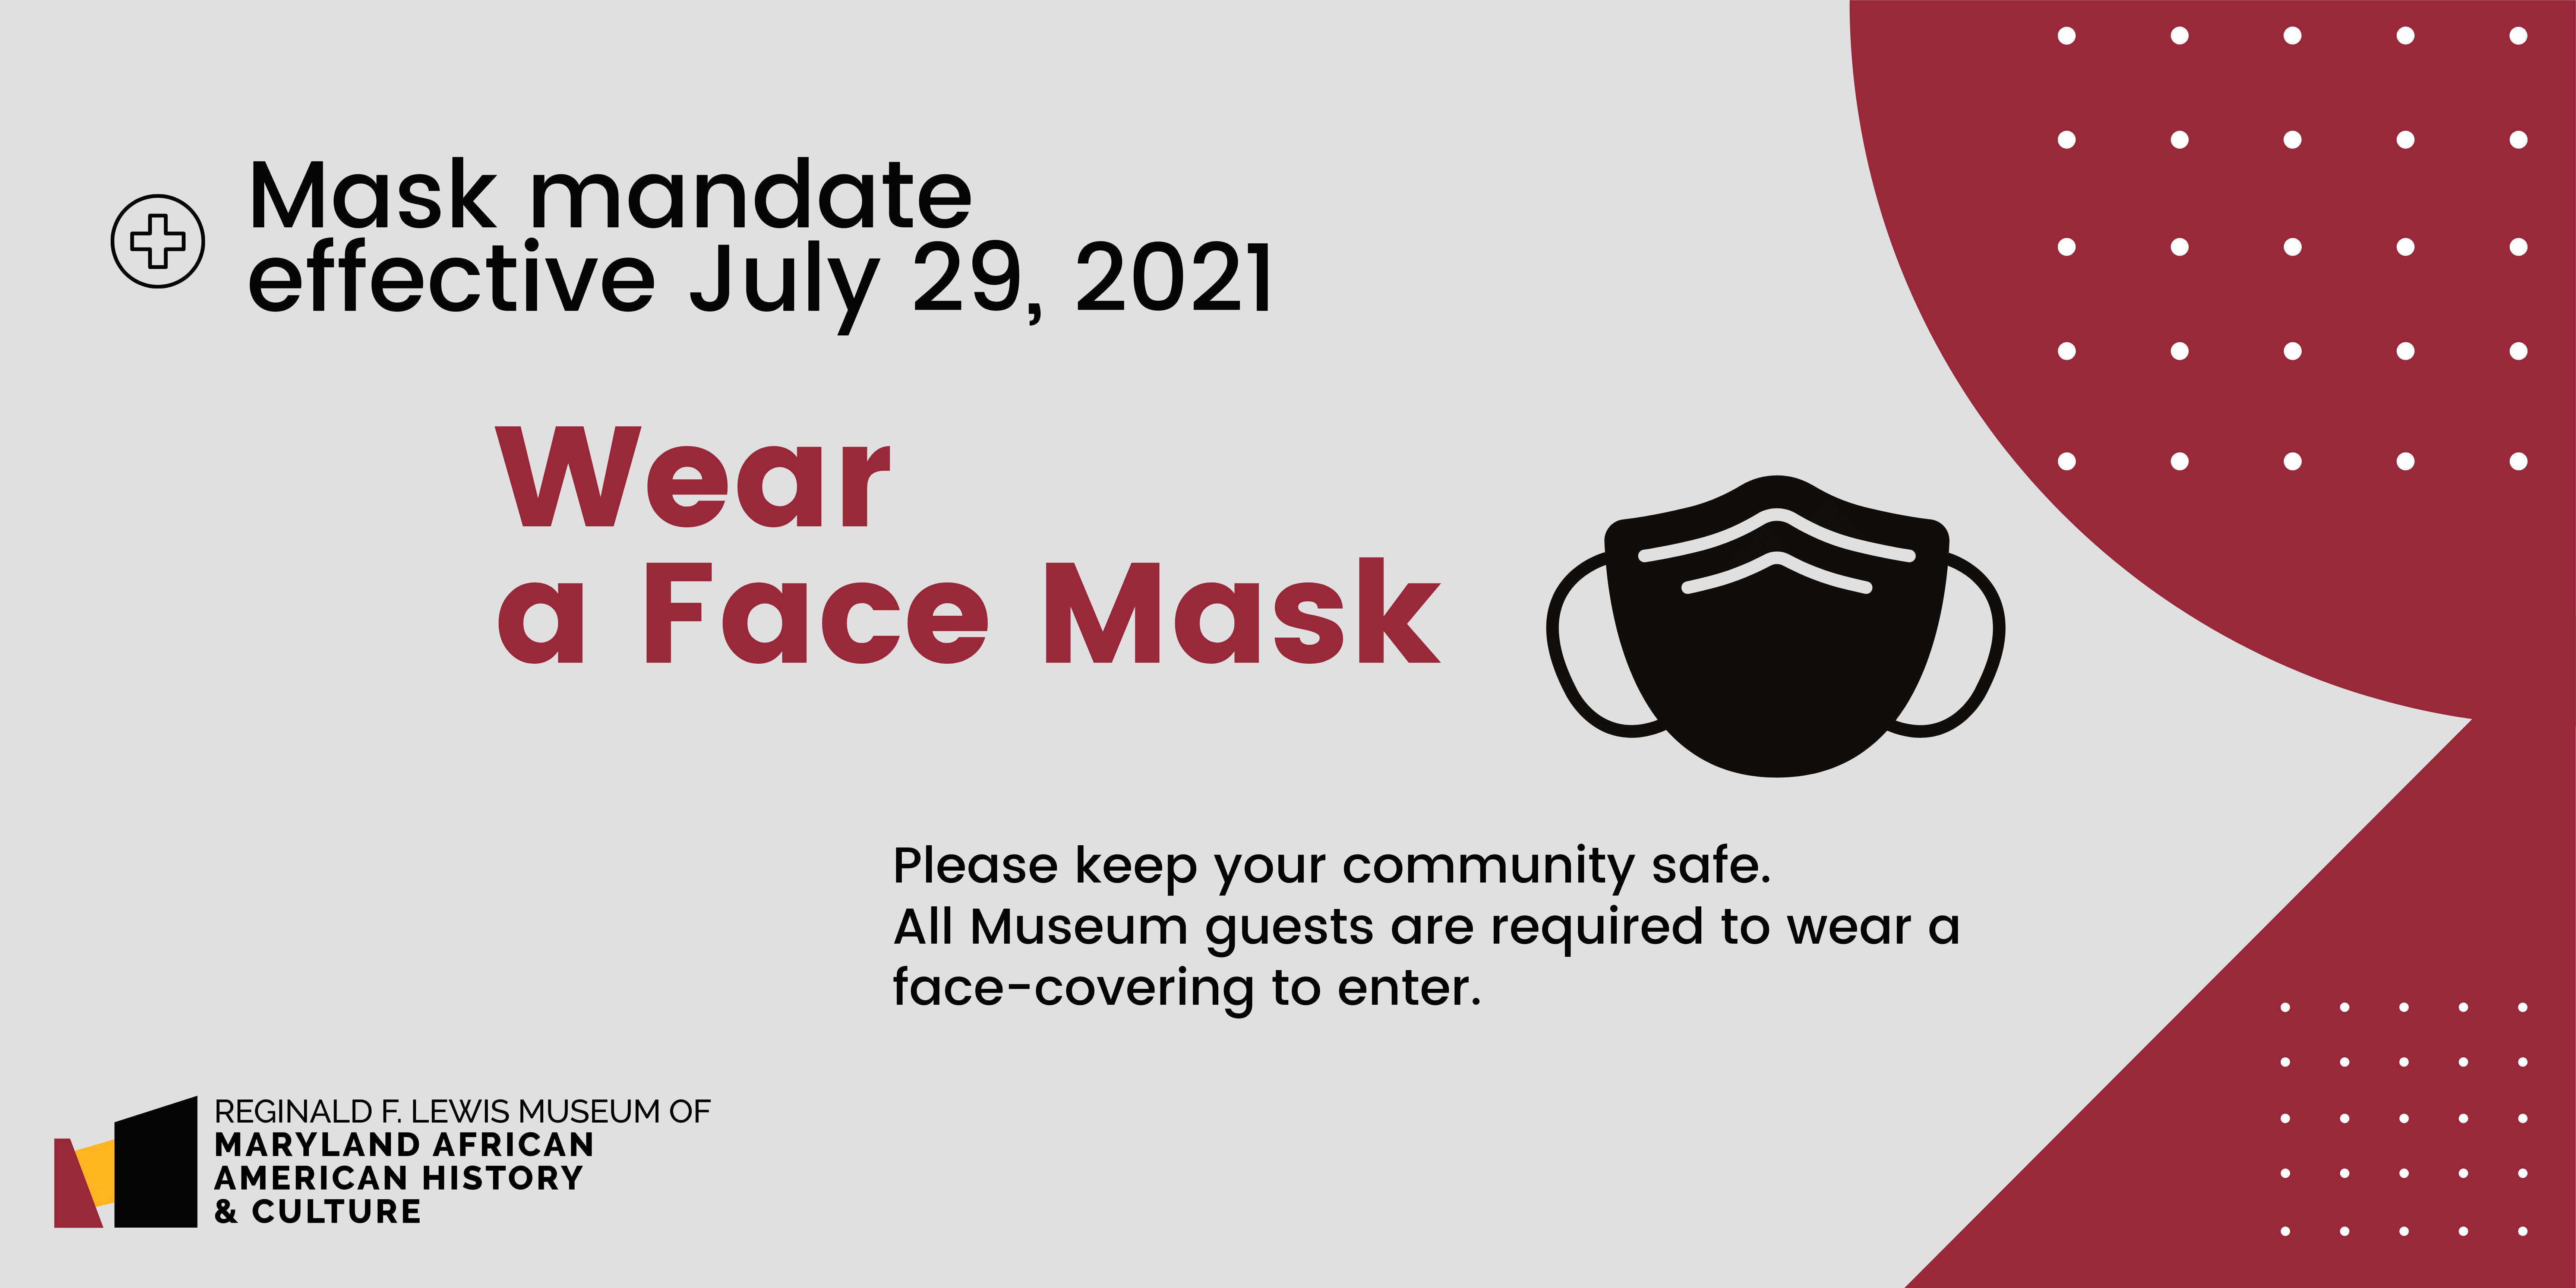 Mask mandate effective July 29, 2021